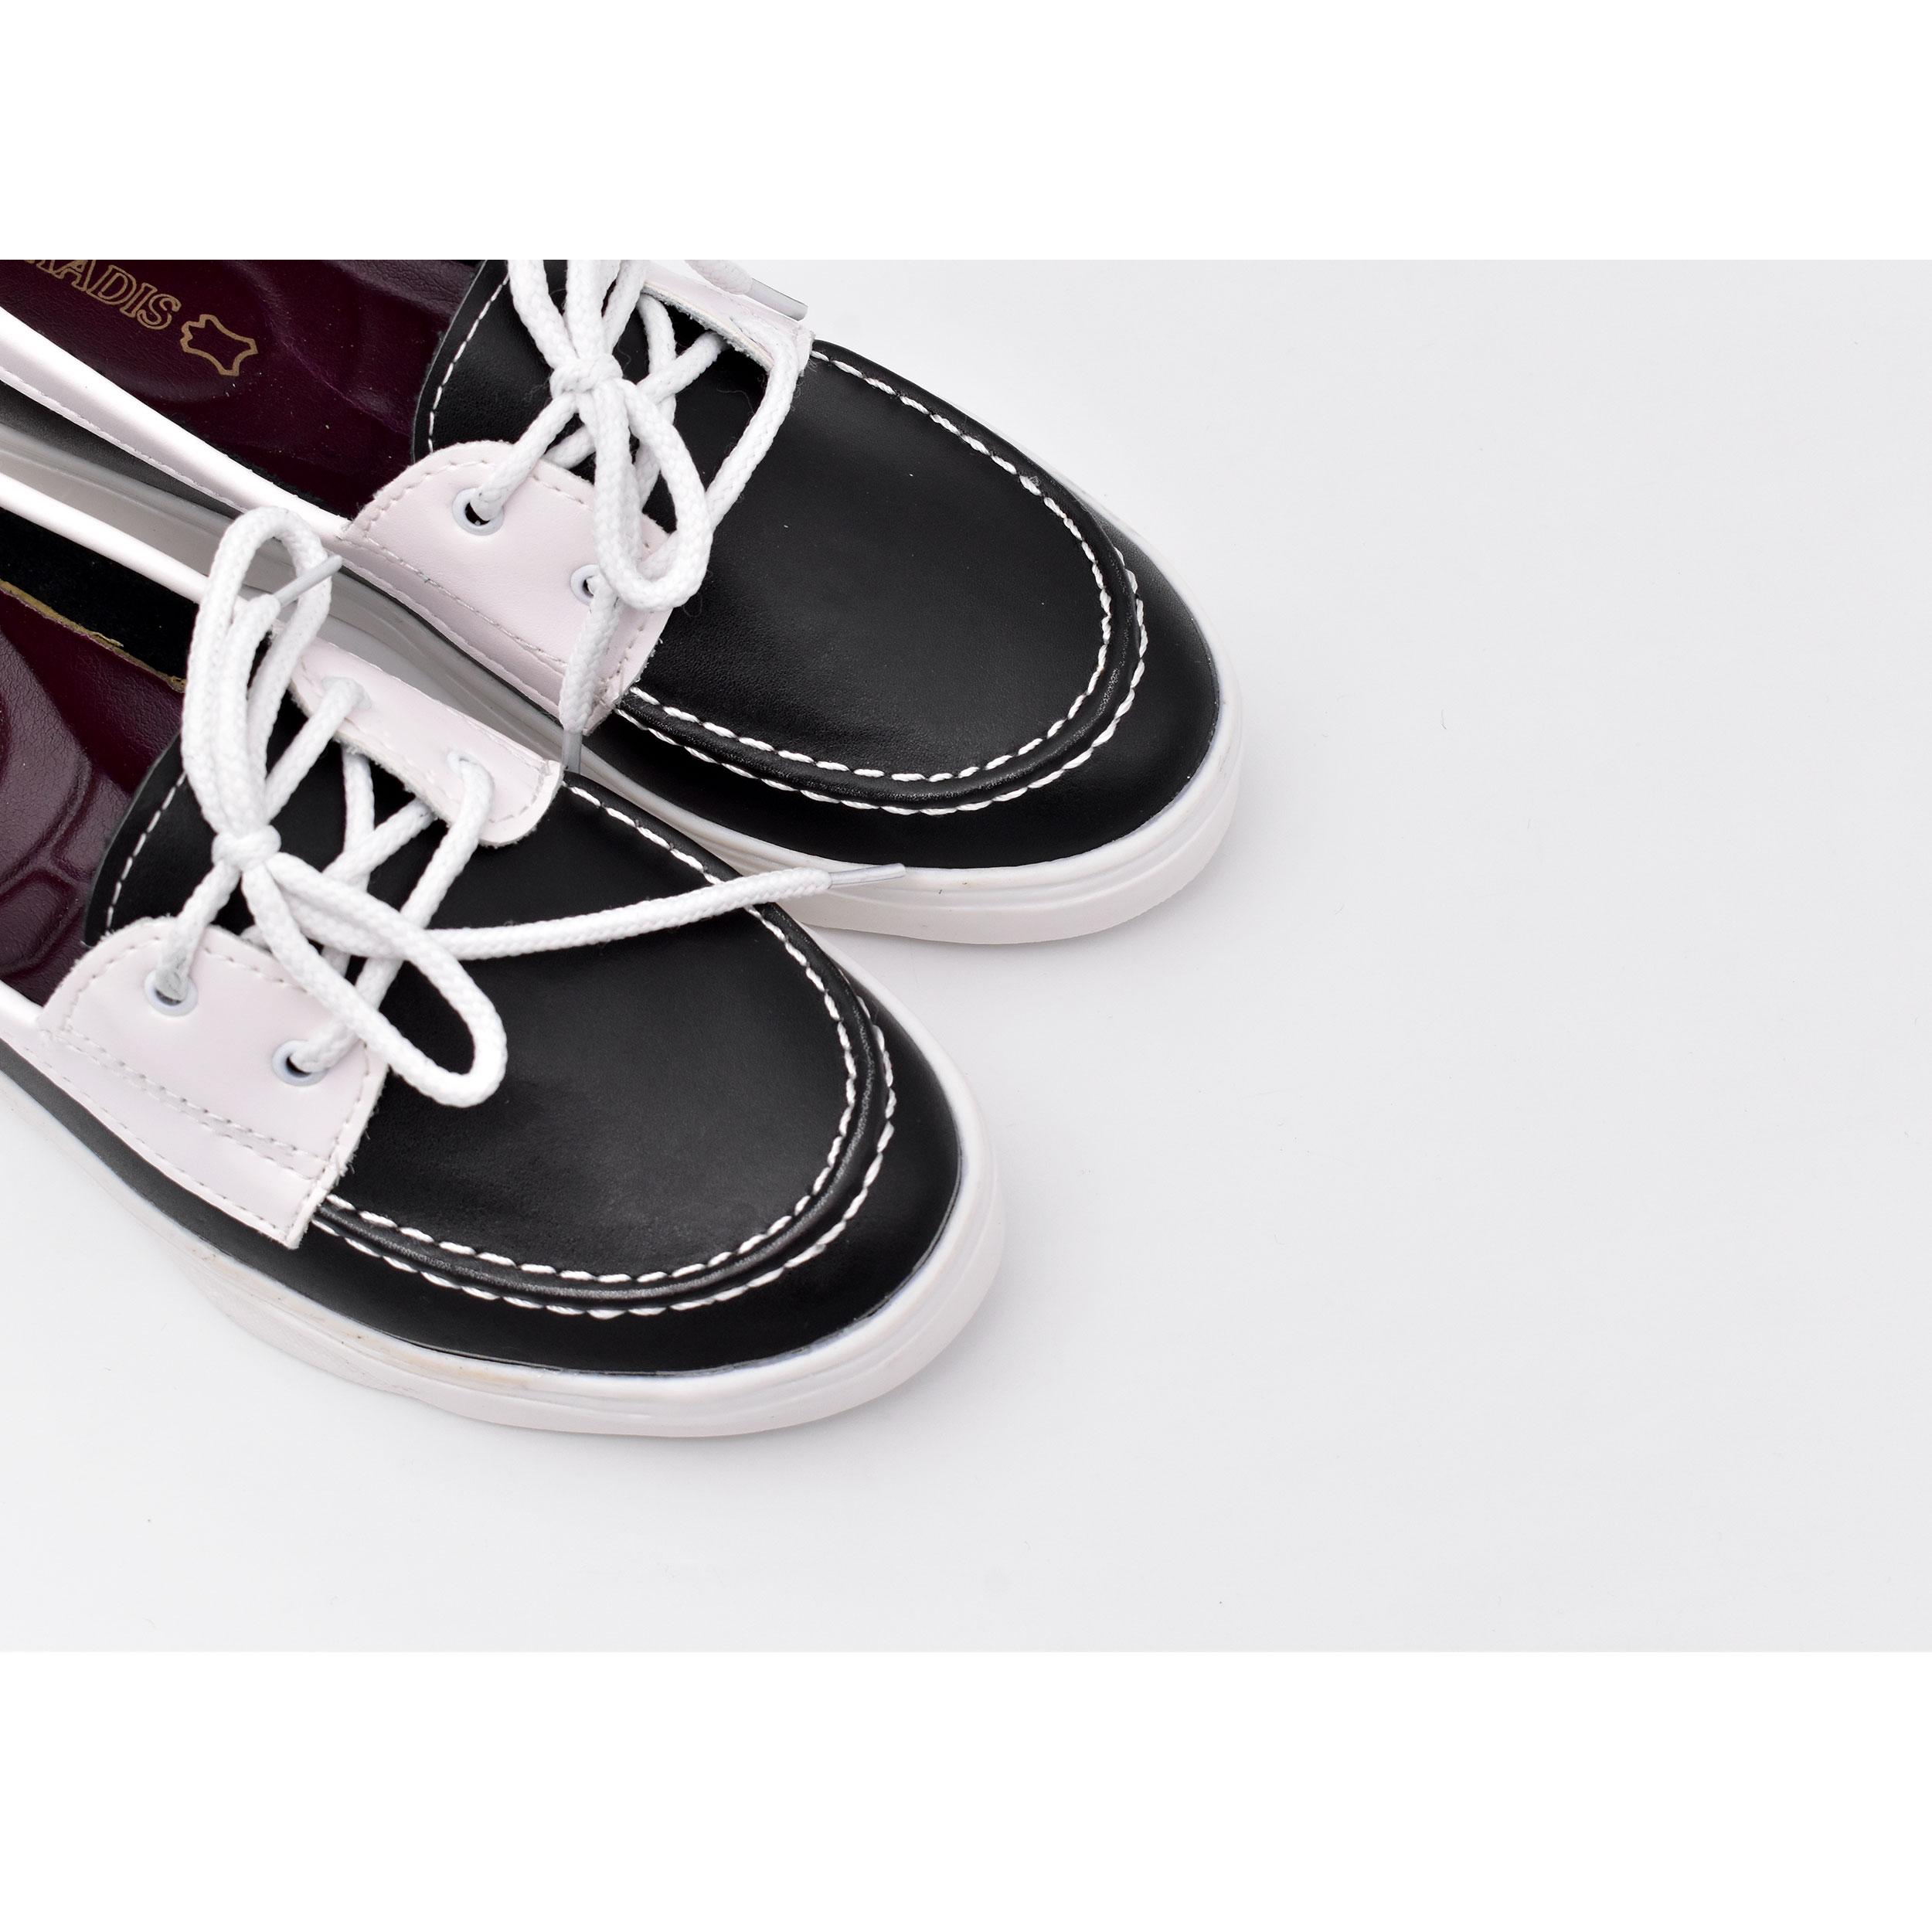 کفش روزمره زنانه کد 8741                     غیر اصل